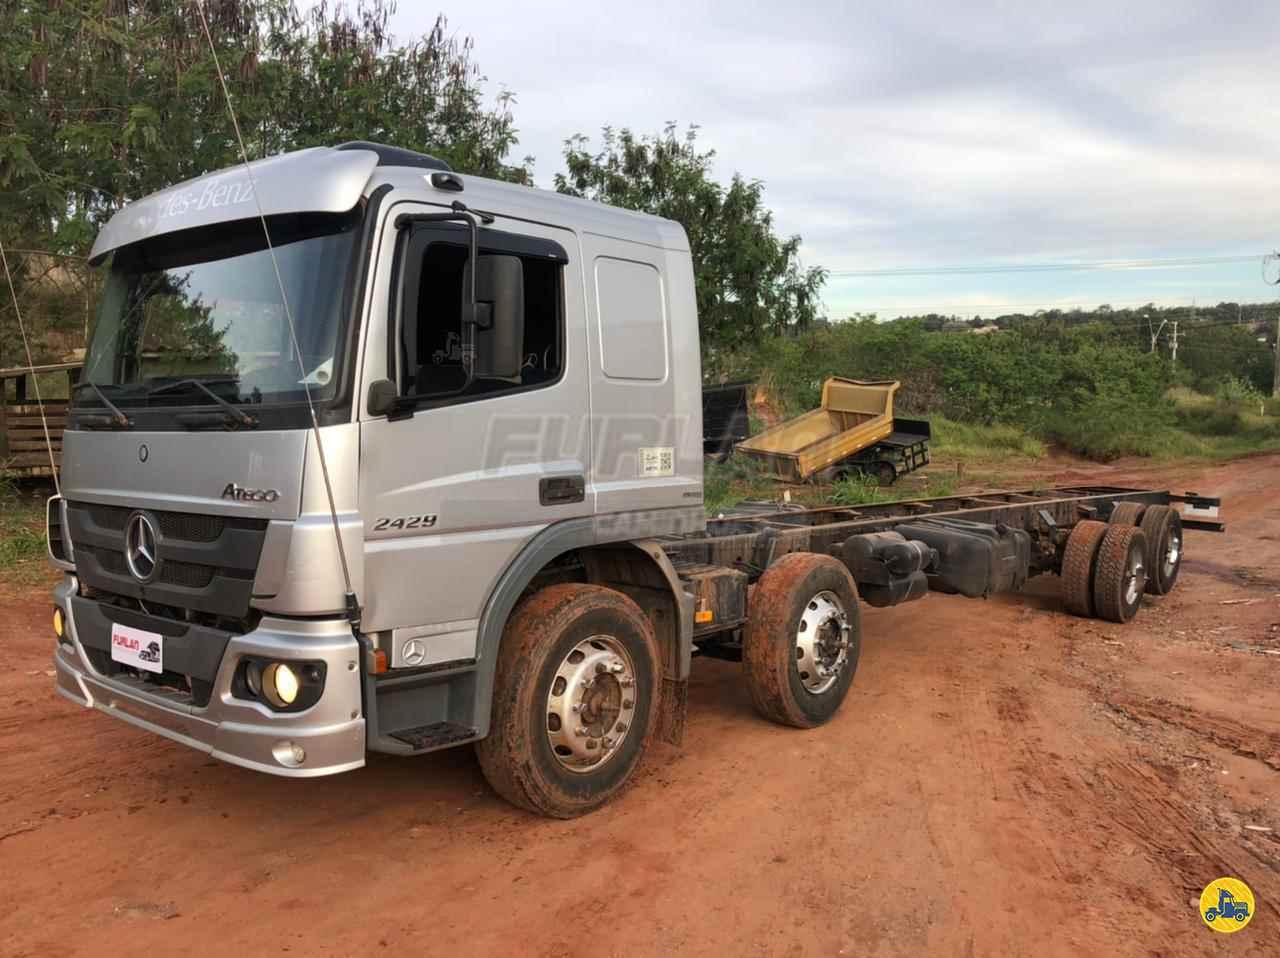 CAMINHAO MERCEDES-BENZ MB 2429 Chassis BiTruck 8x2 Furlan Caminhões UMUARAMA PARANÁ PR